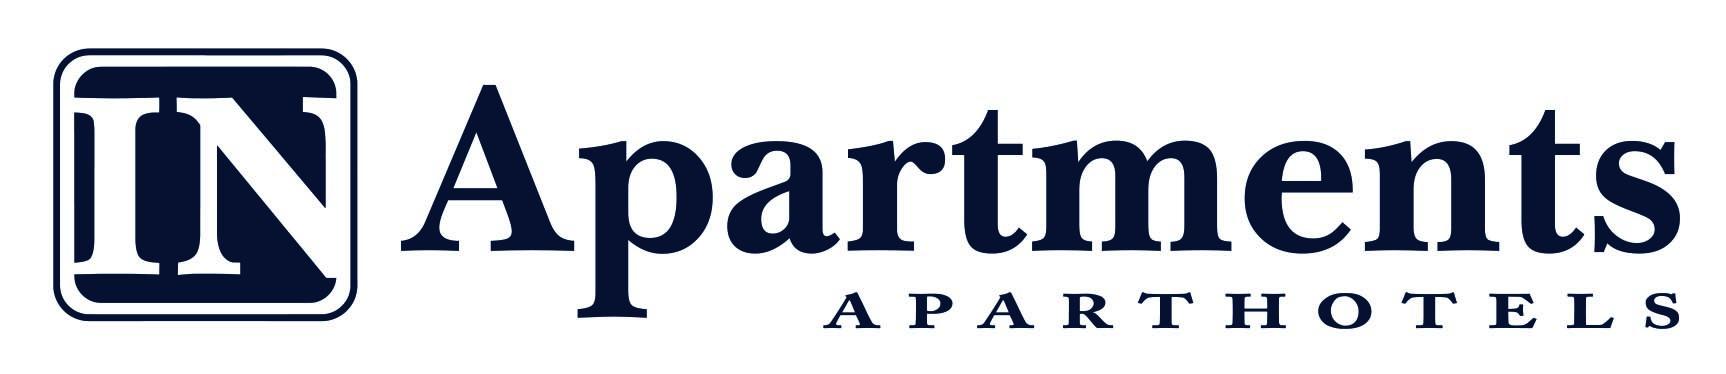 INApartments – Apartamenty, Aparthotele